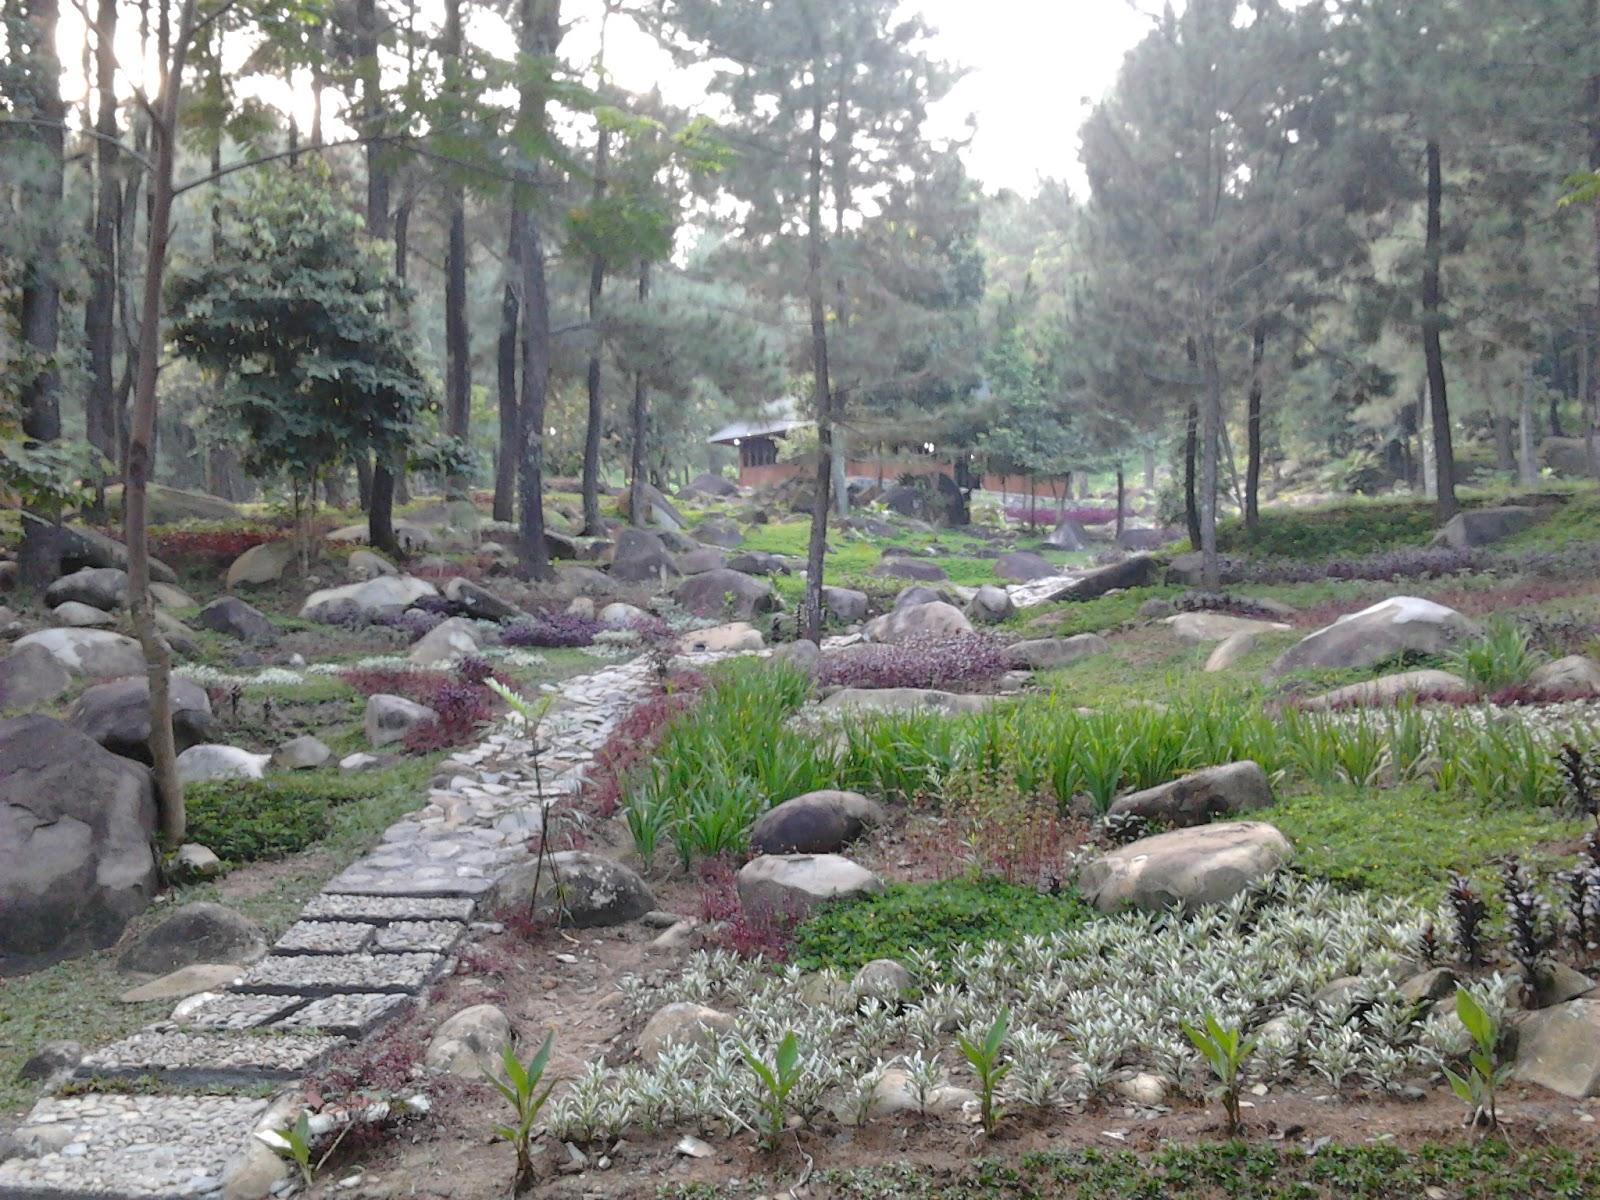 5 Abroad: Camping at Taman Wisata Alam Gunung Pancar